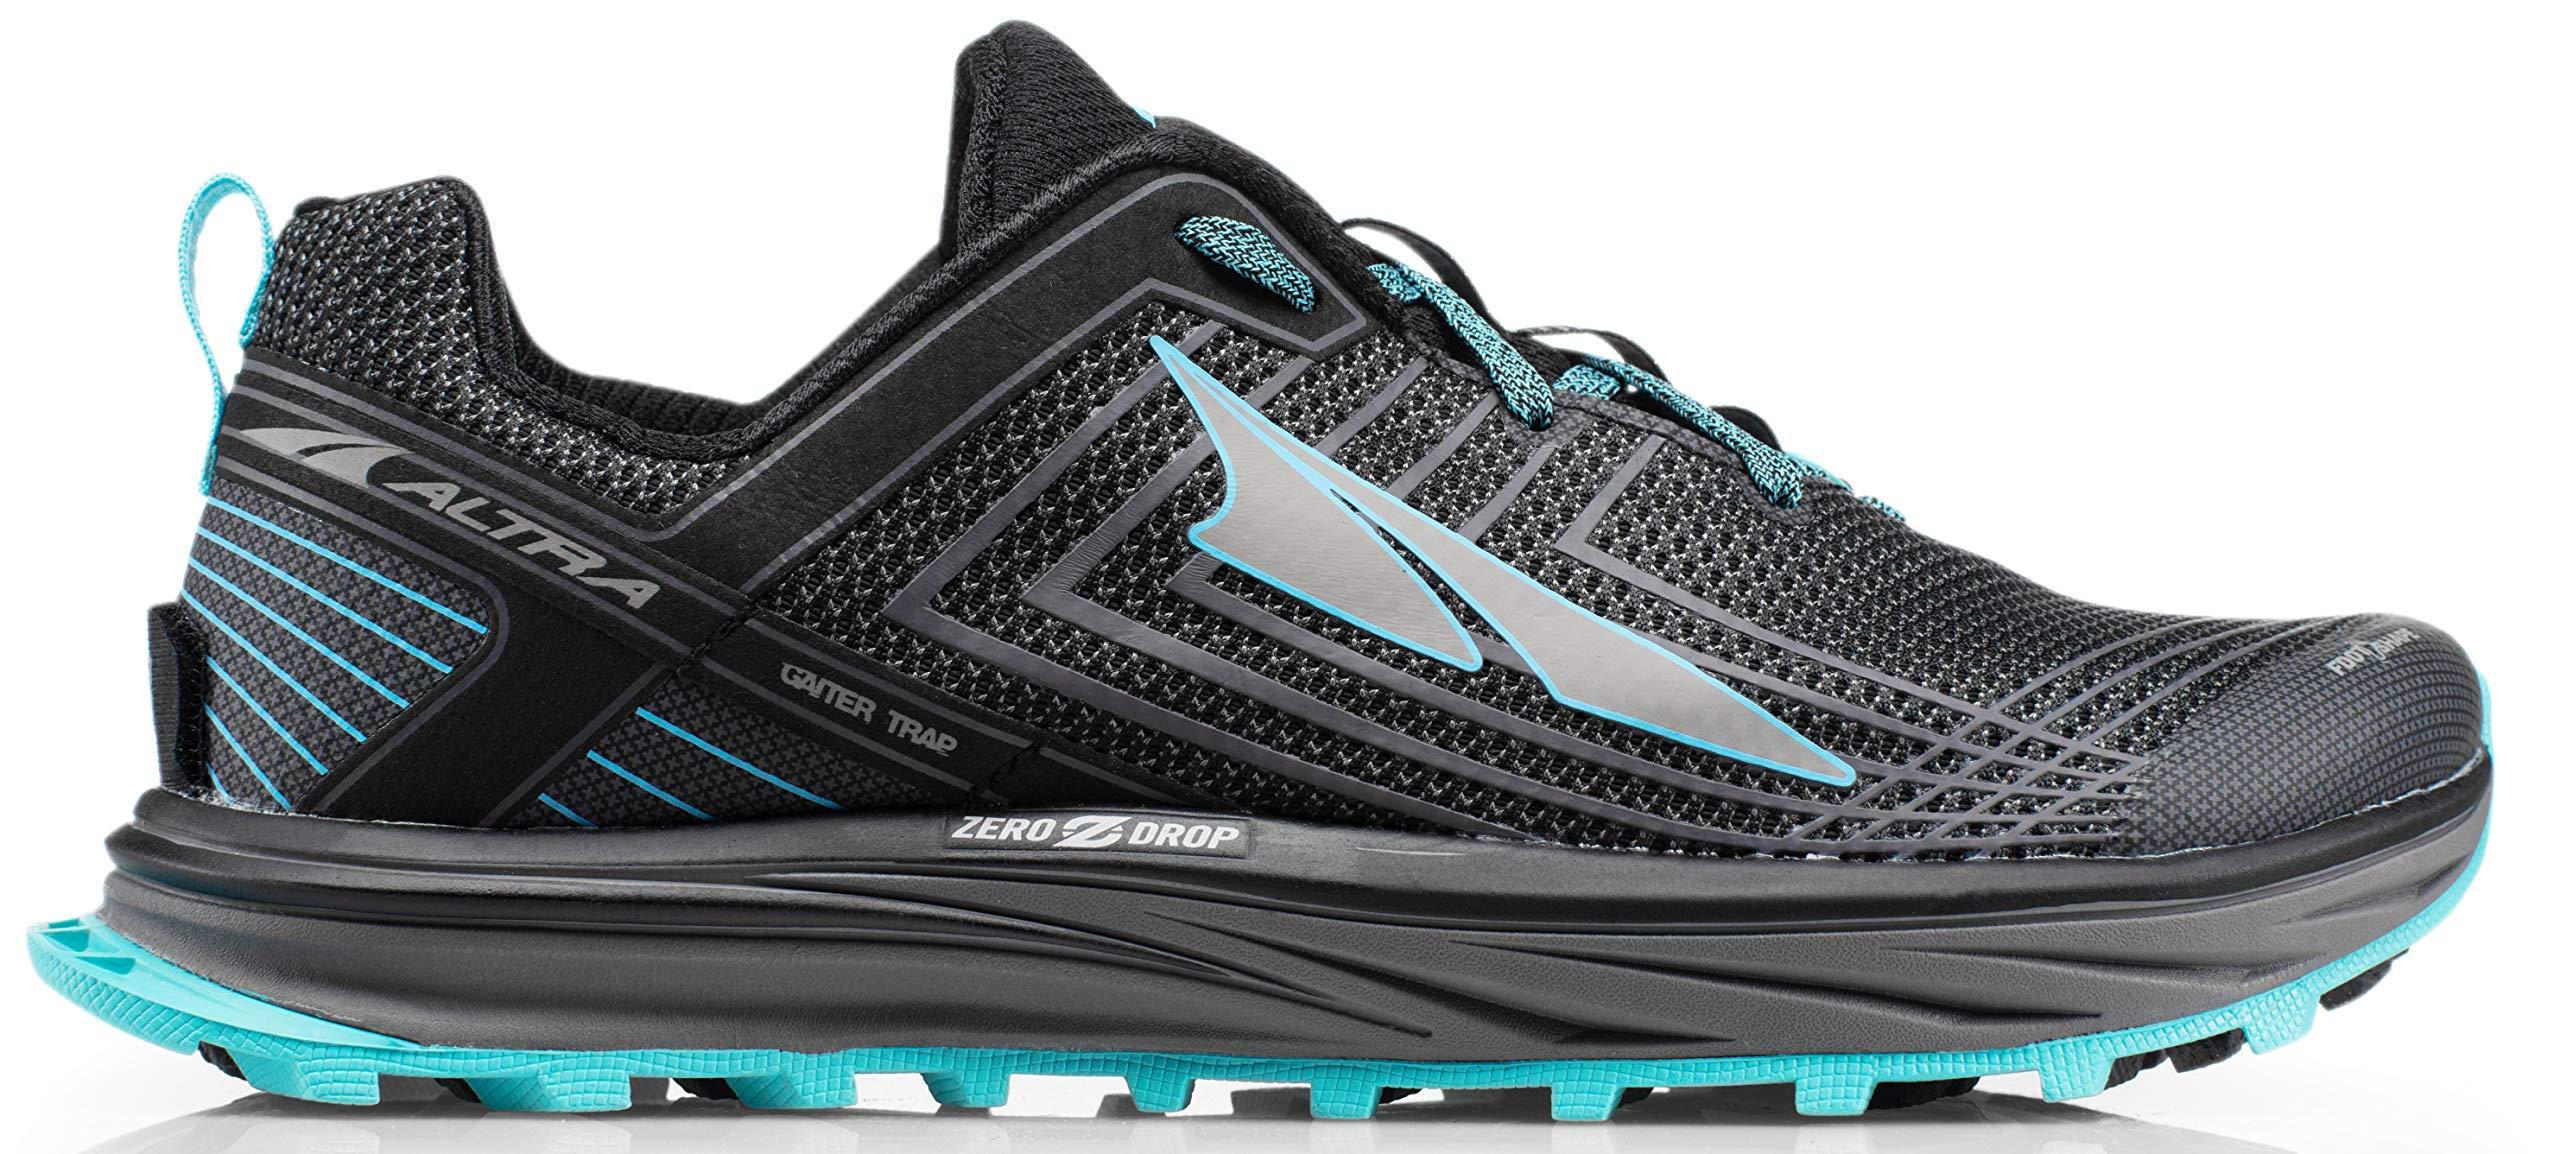 Altra AFM1957F Men's TIMP 1.5 Trail Running Shoe, Gray/Blue - 8 D(M) US